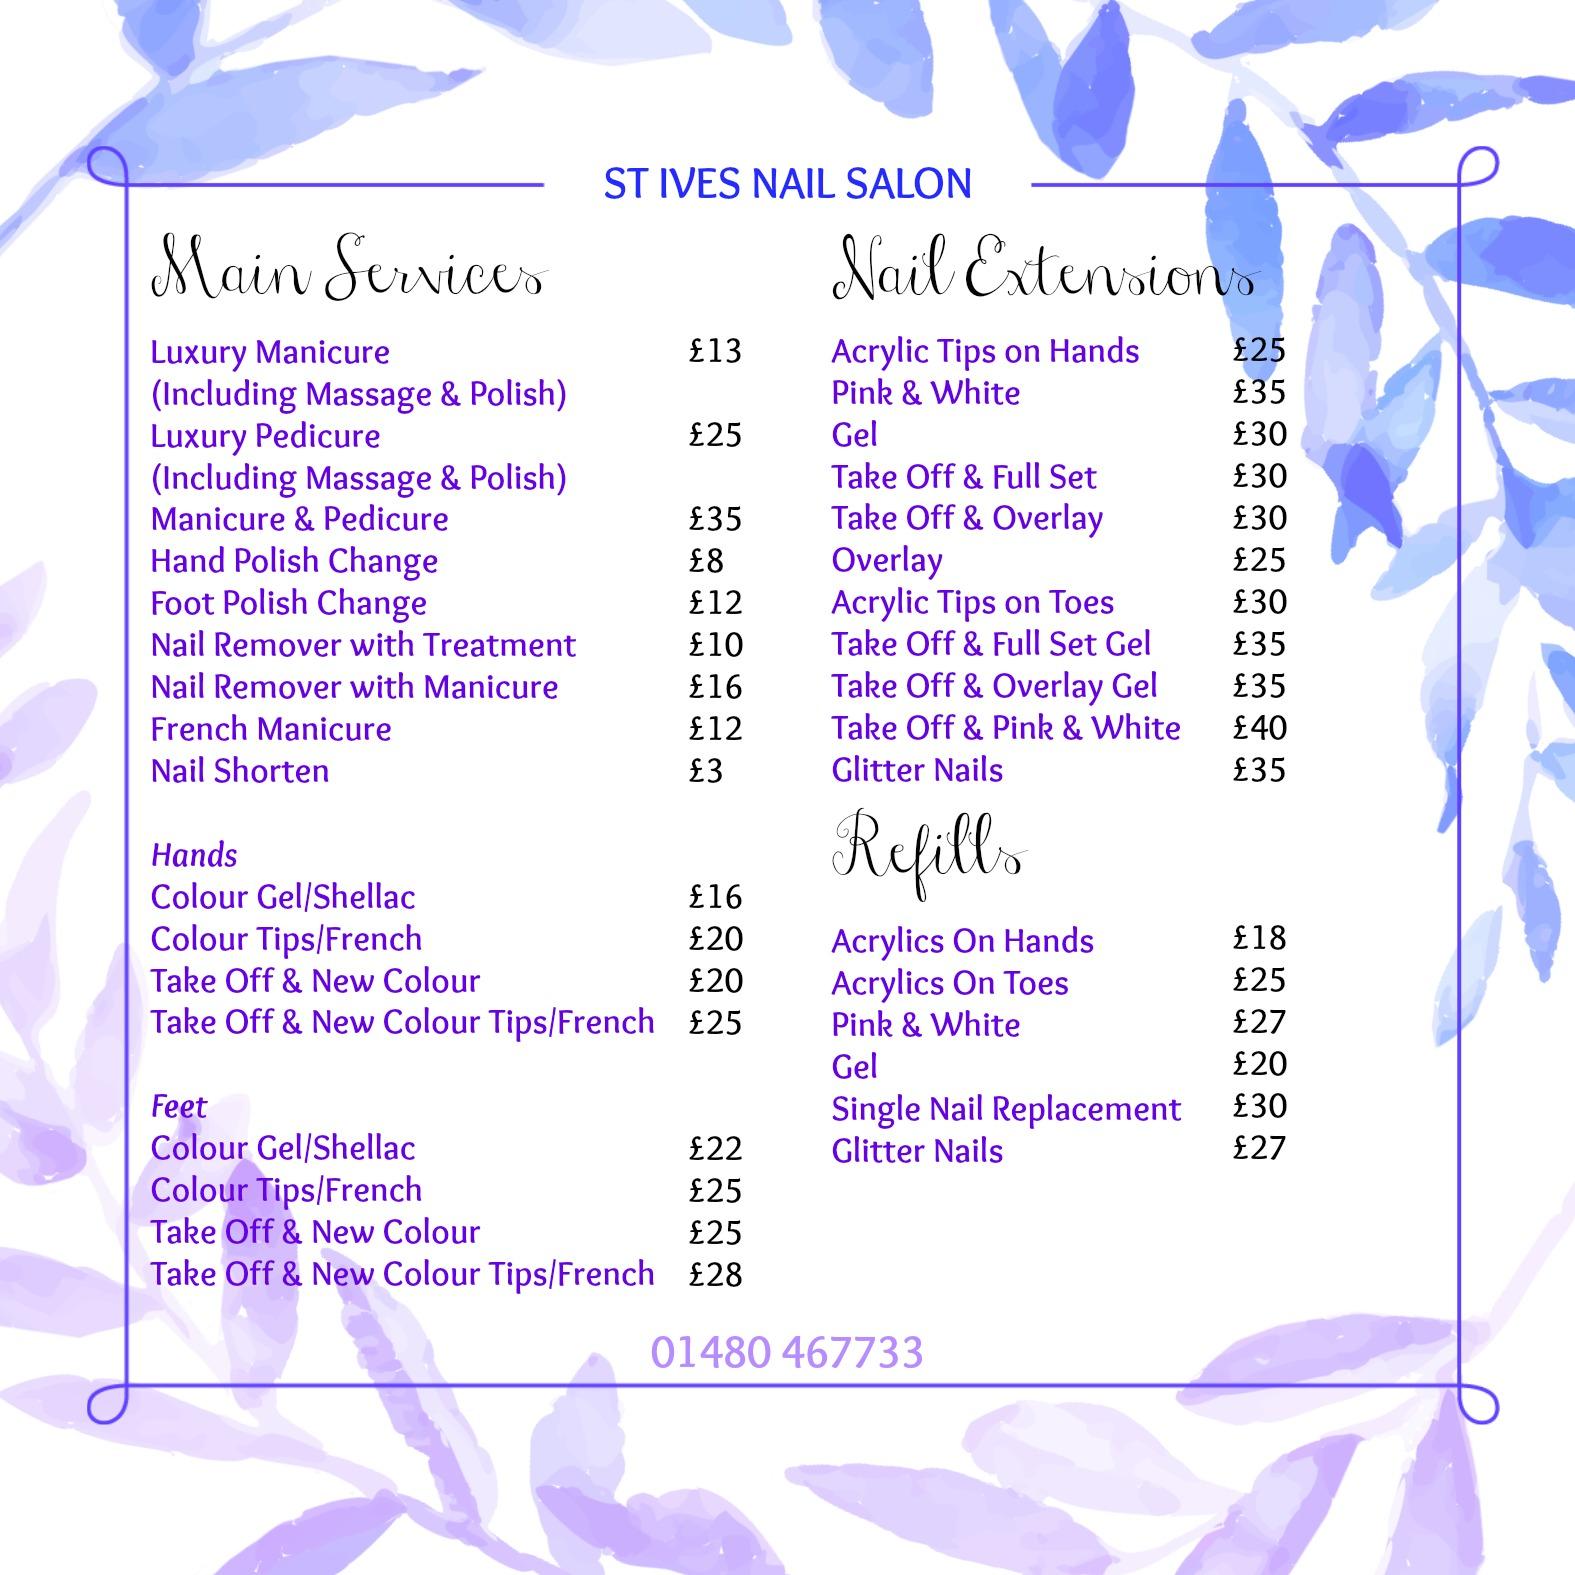 Price List | St Ives Nail Salon